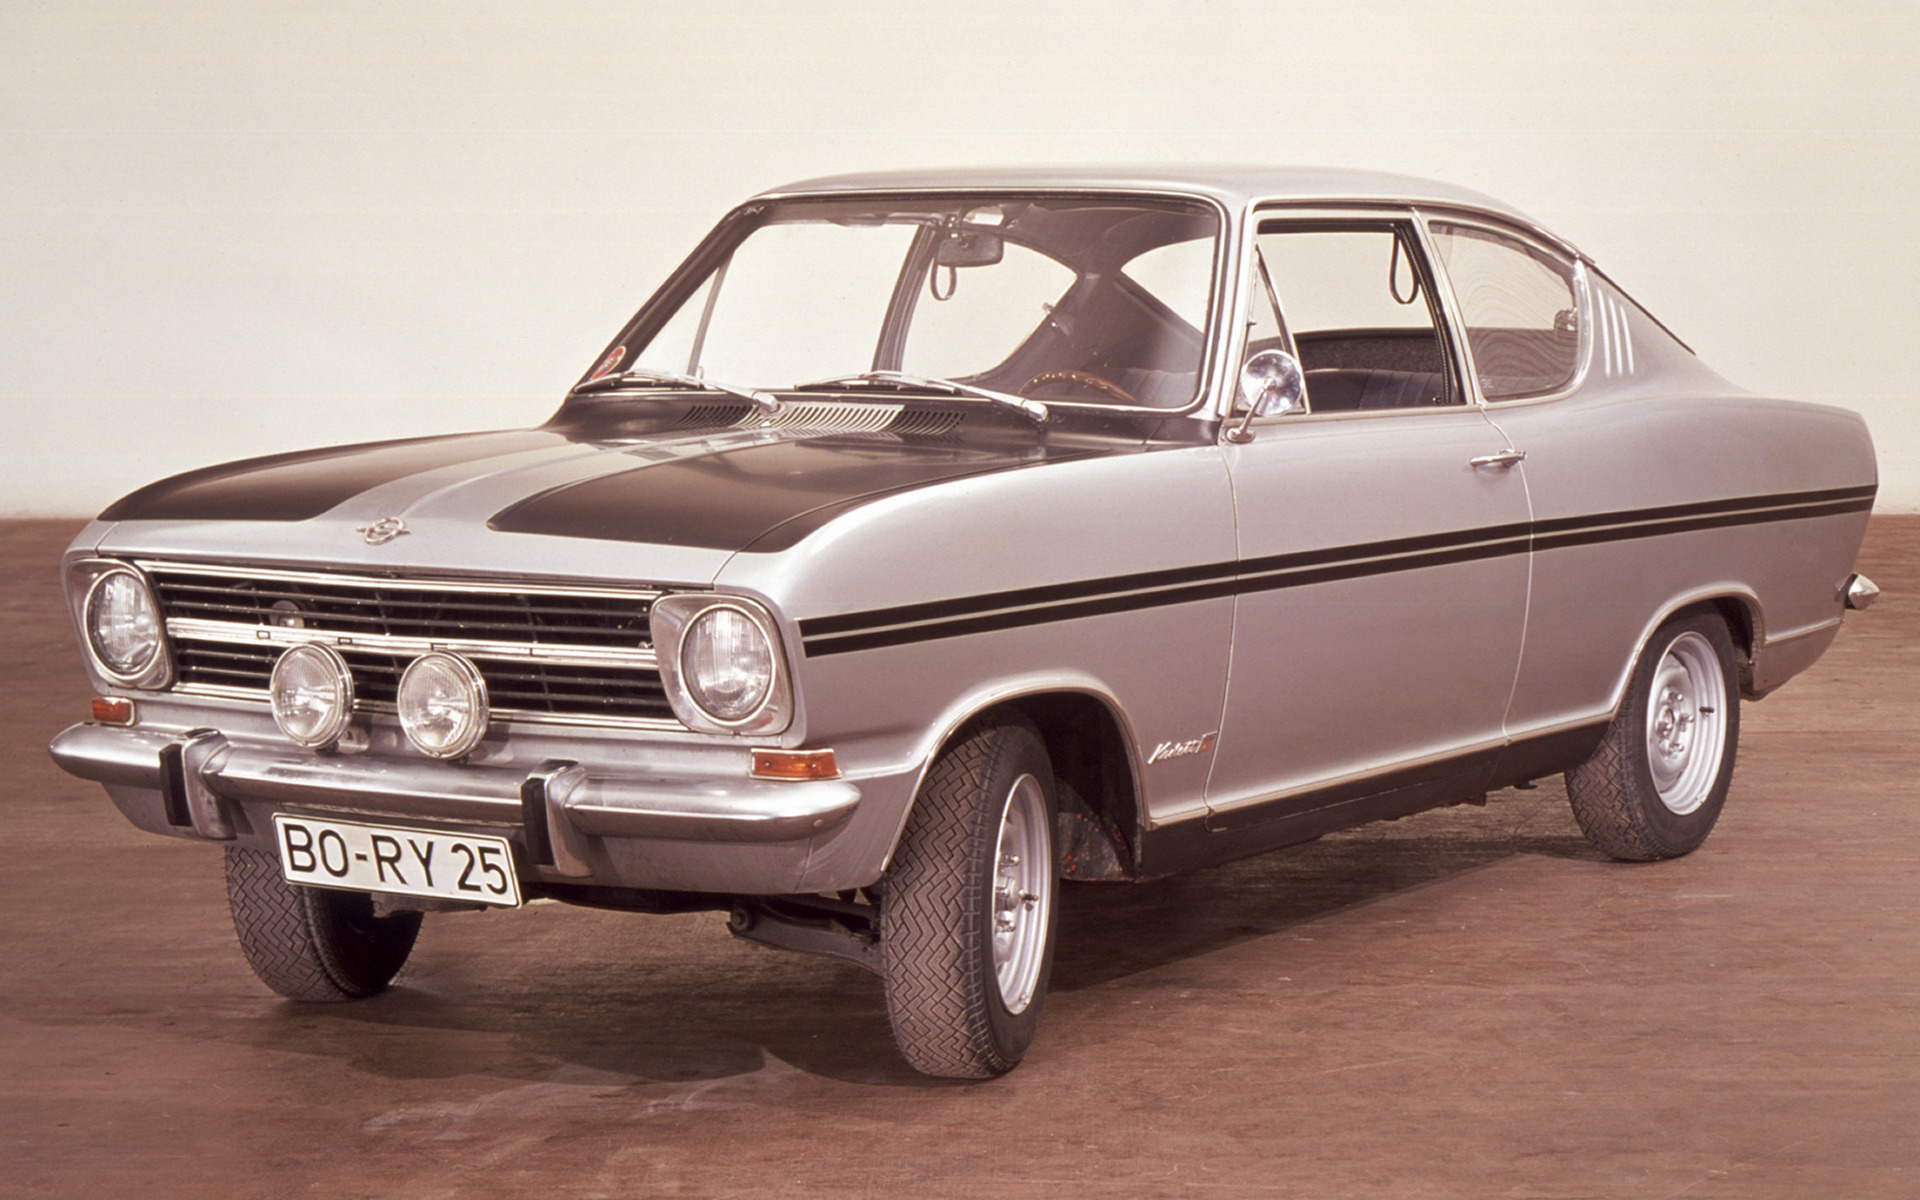 1966 Opel Rallye Kadett Kiemen Coupe Papeis De Parede E Imagens De Fundo Em Hd Car Pixel